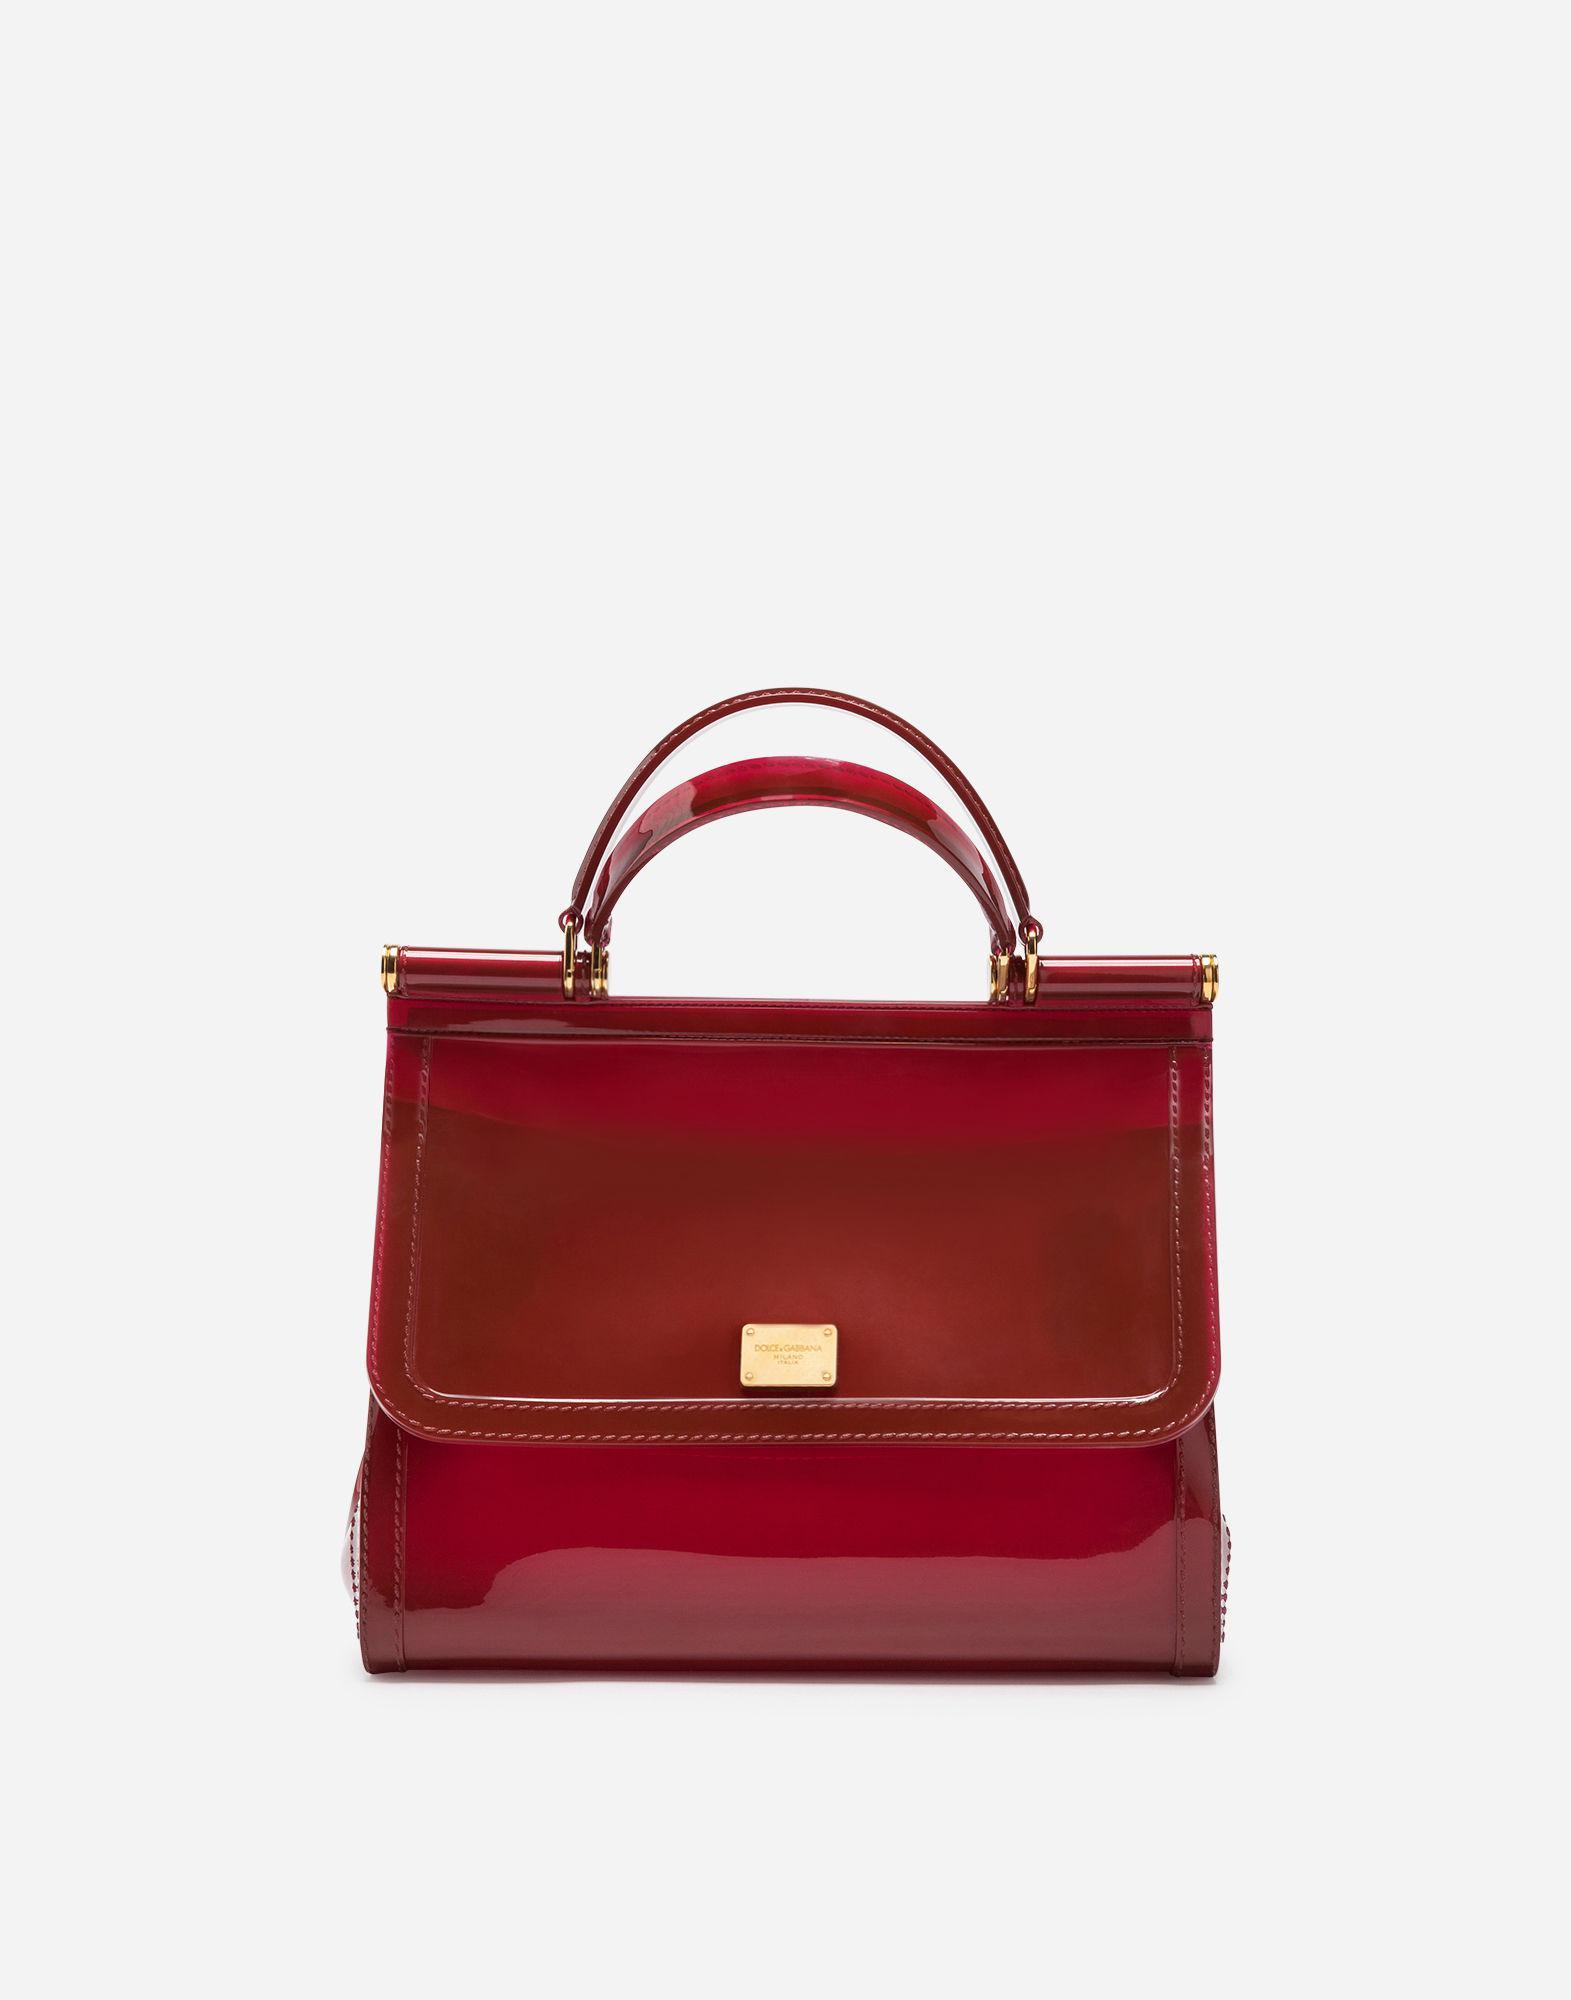 357db84e1a70 Lyst - Dolce   Gabbana Semi-transparent Rubber Sicily Handbag in Red